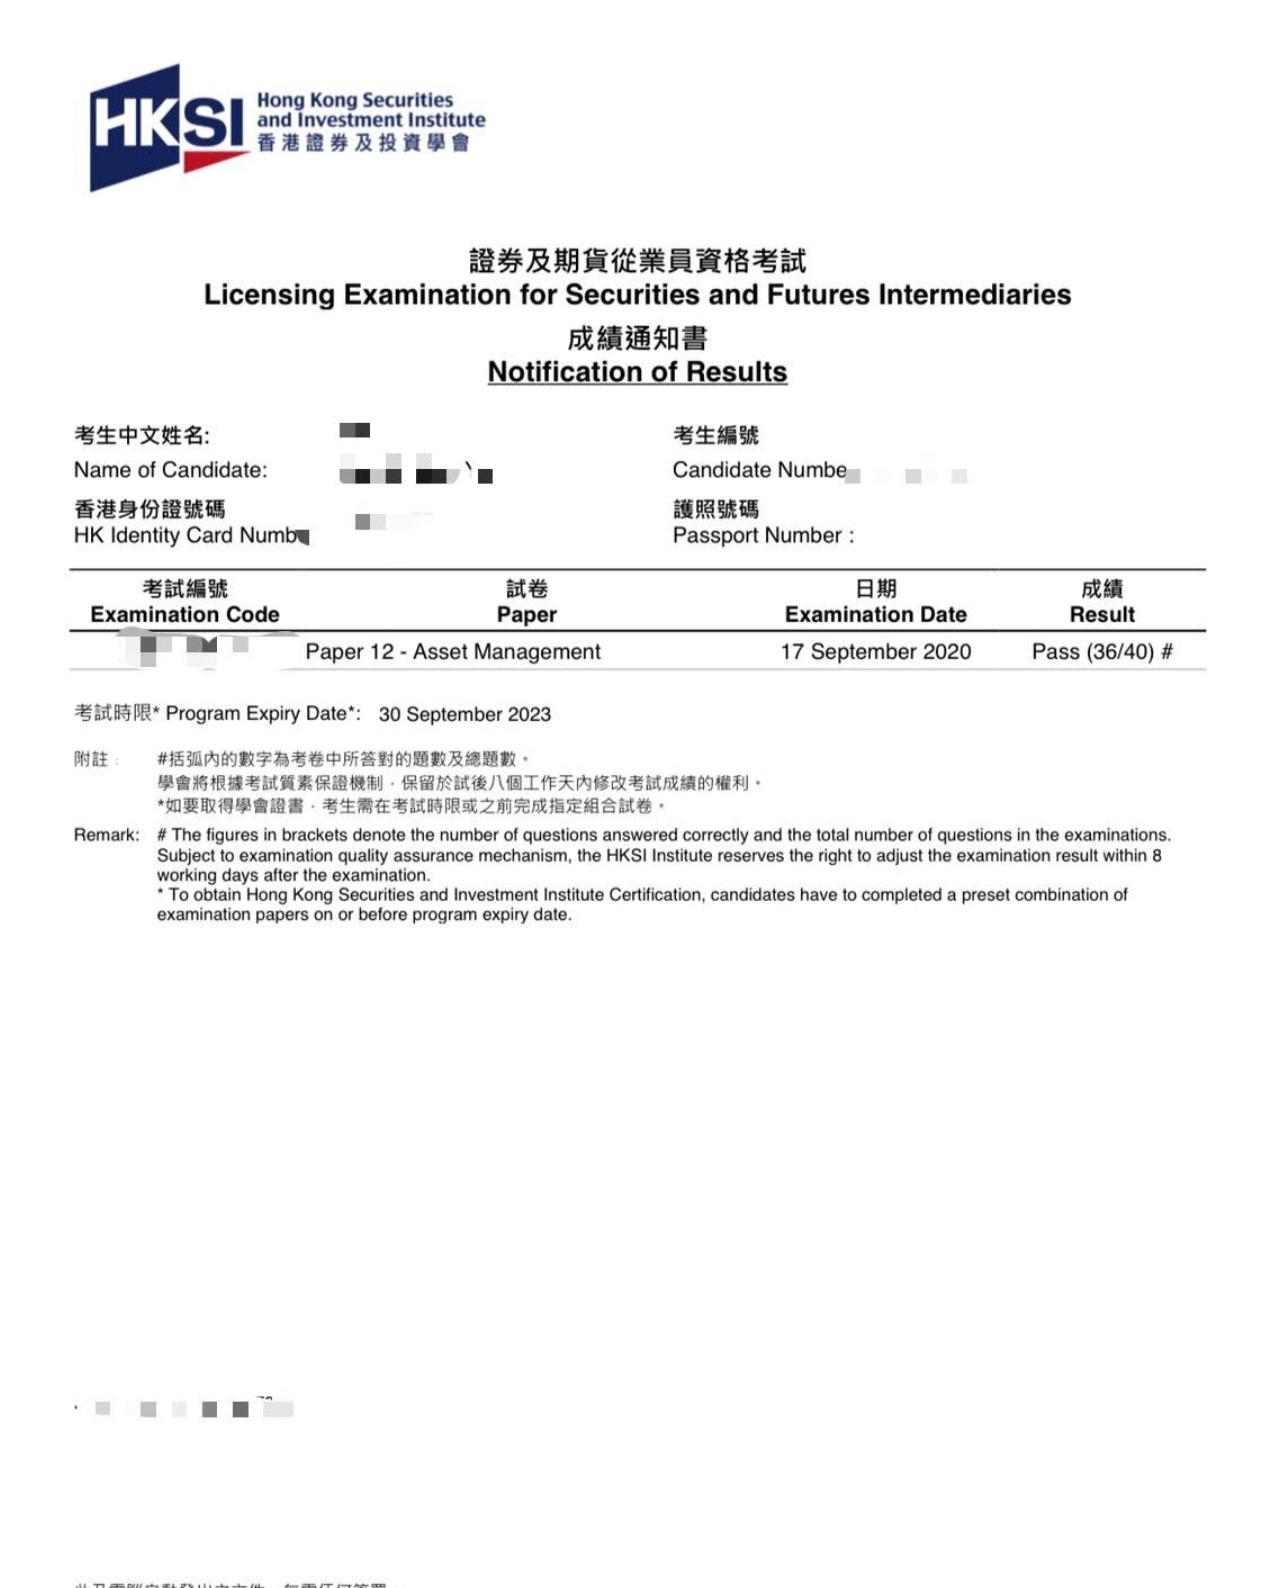 CYH 17/09/2020 LE Paper 12 證券期貨從業員資格考試卷十二 Pass